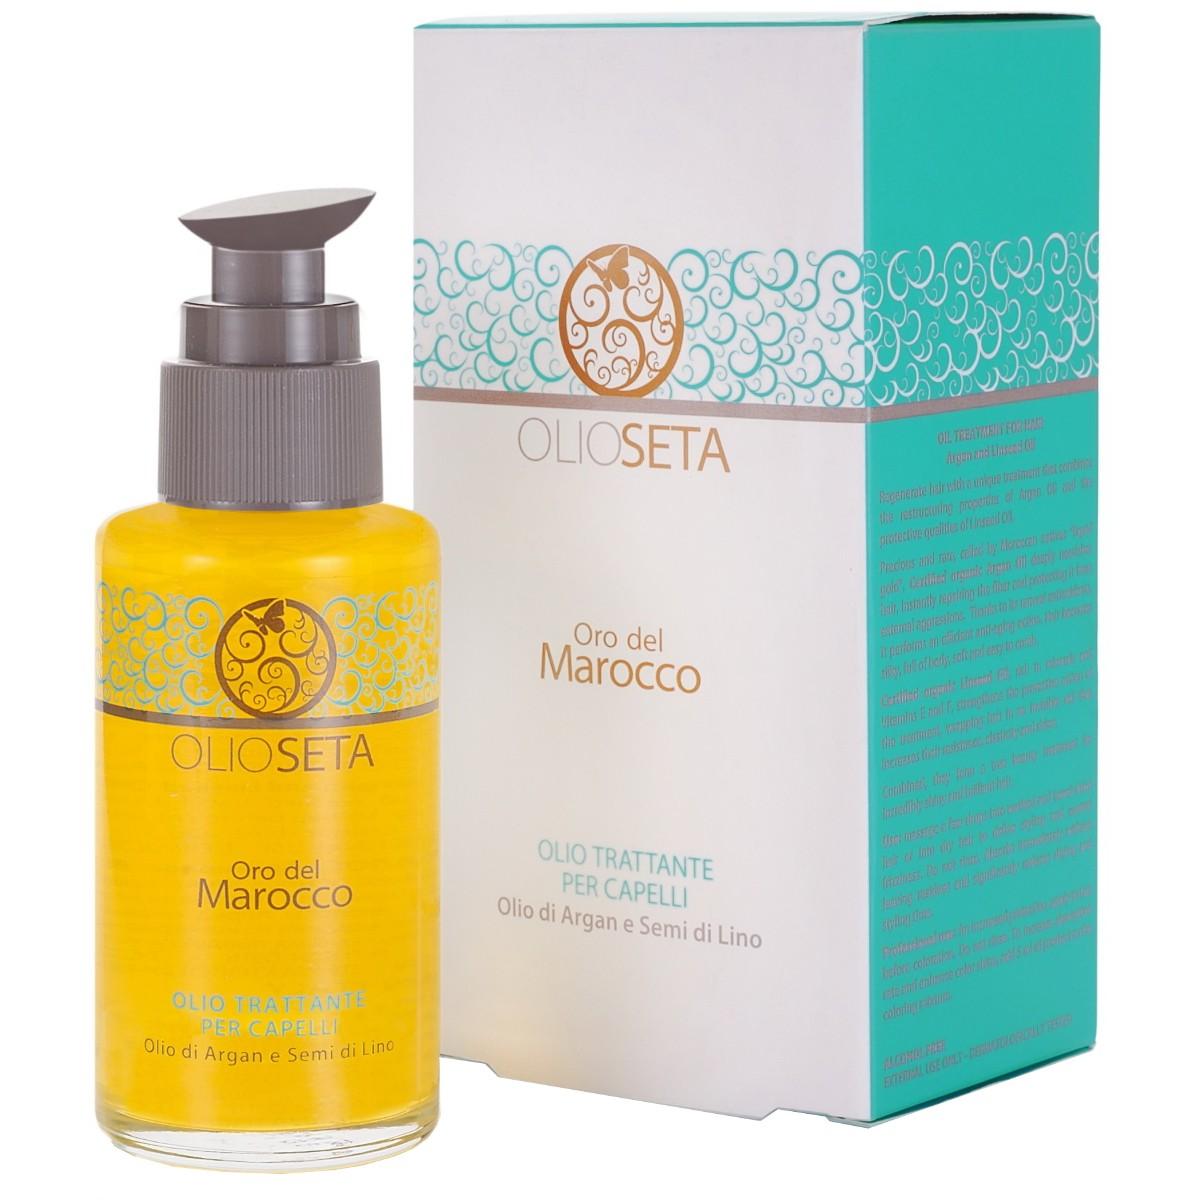 Olioseta oro del marocco для волос отзывы